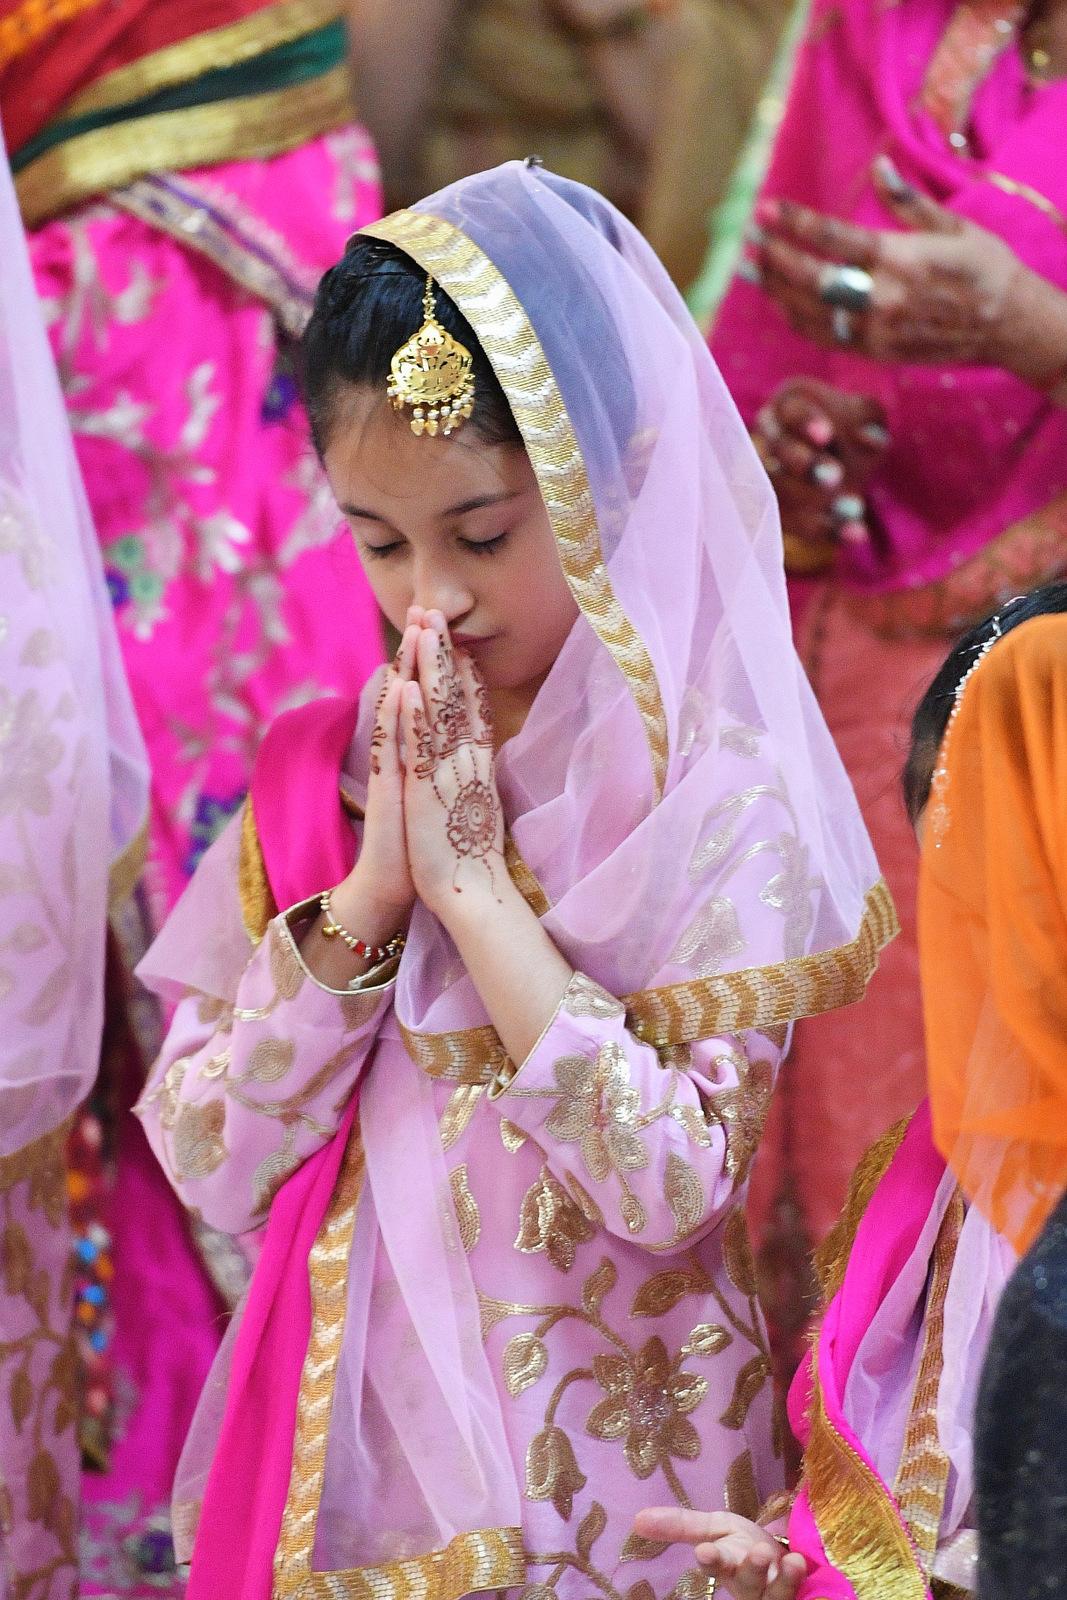 houston-weddings-manjot-karanjit-09.jpg